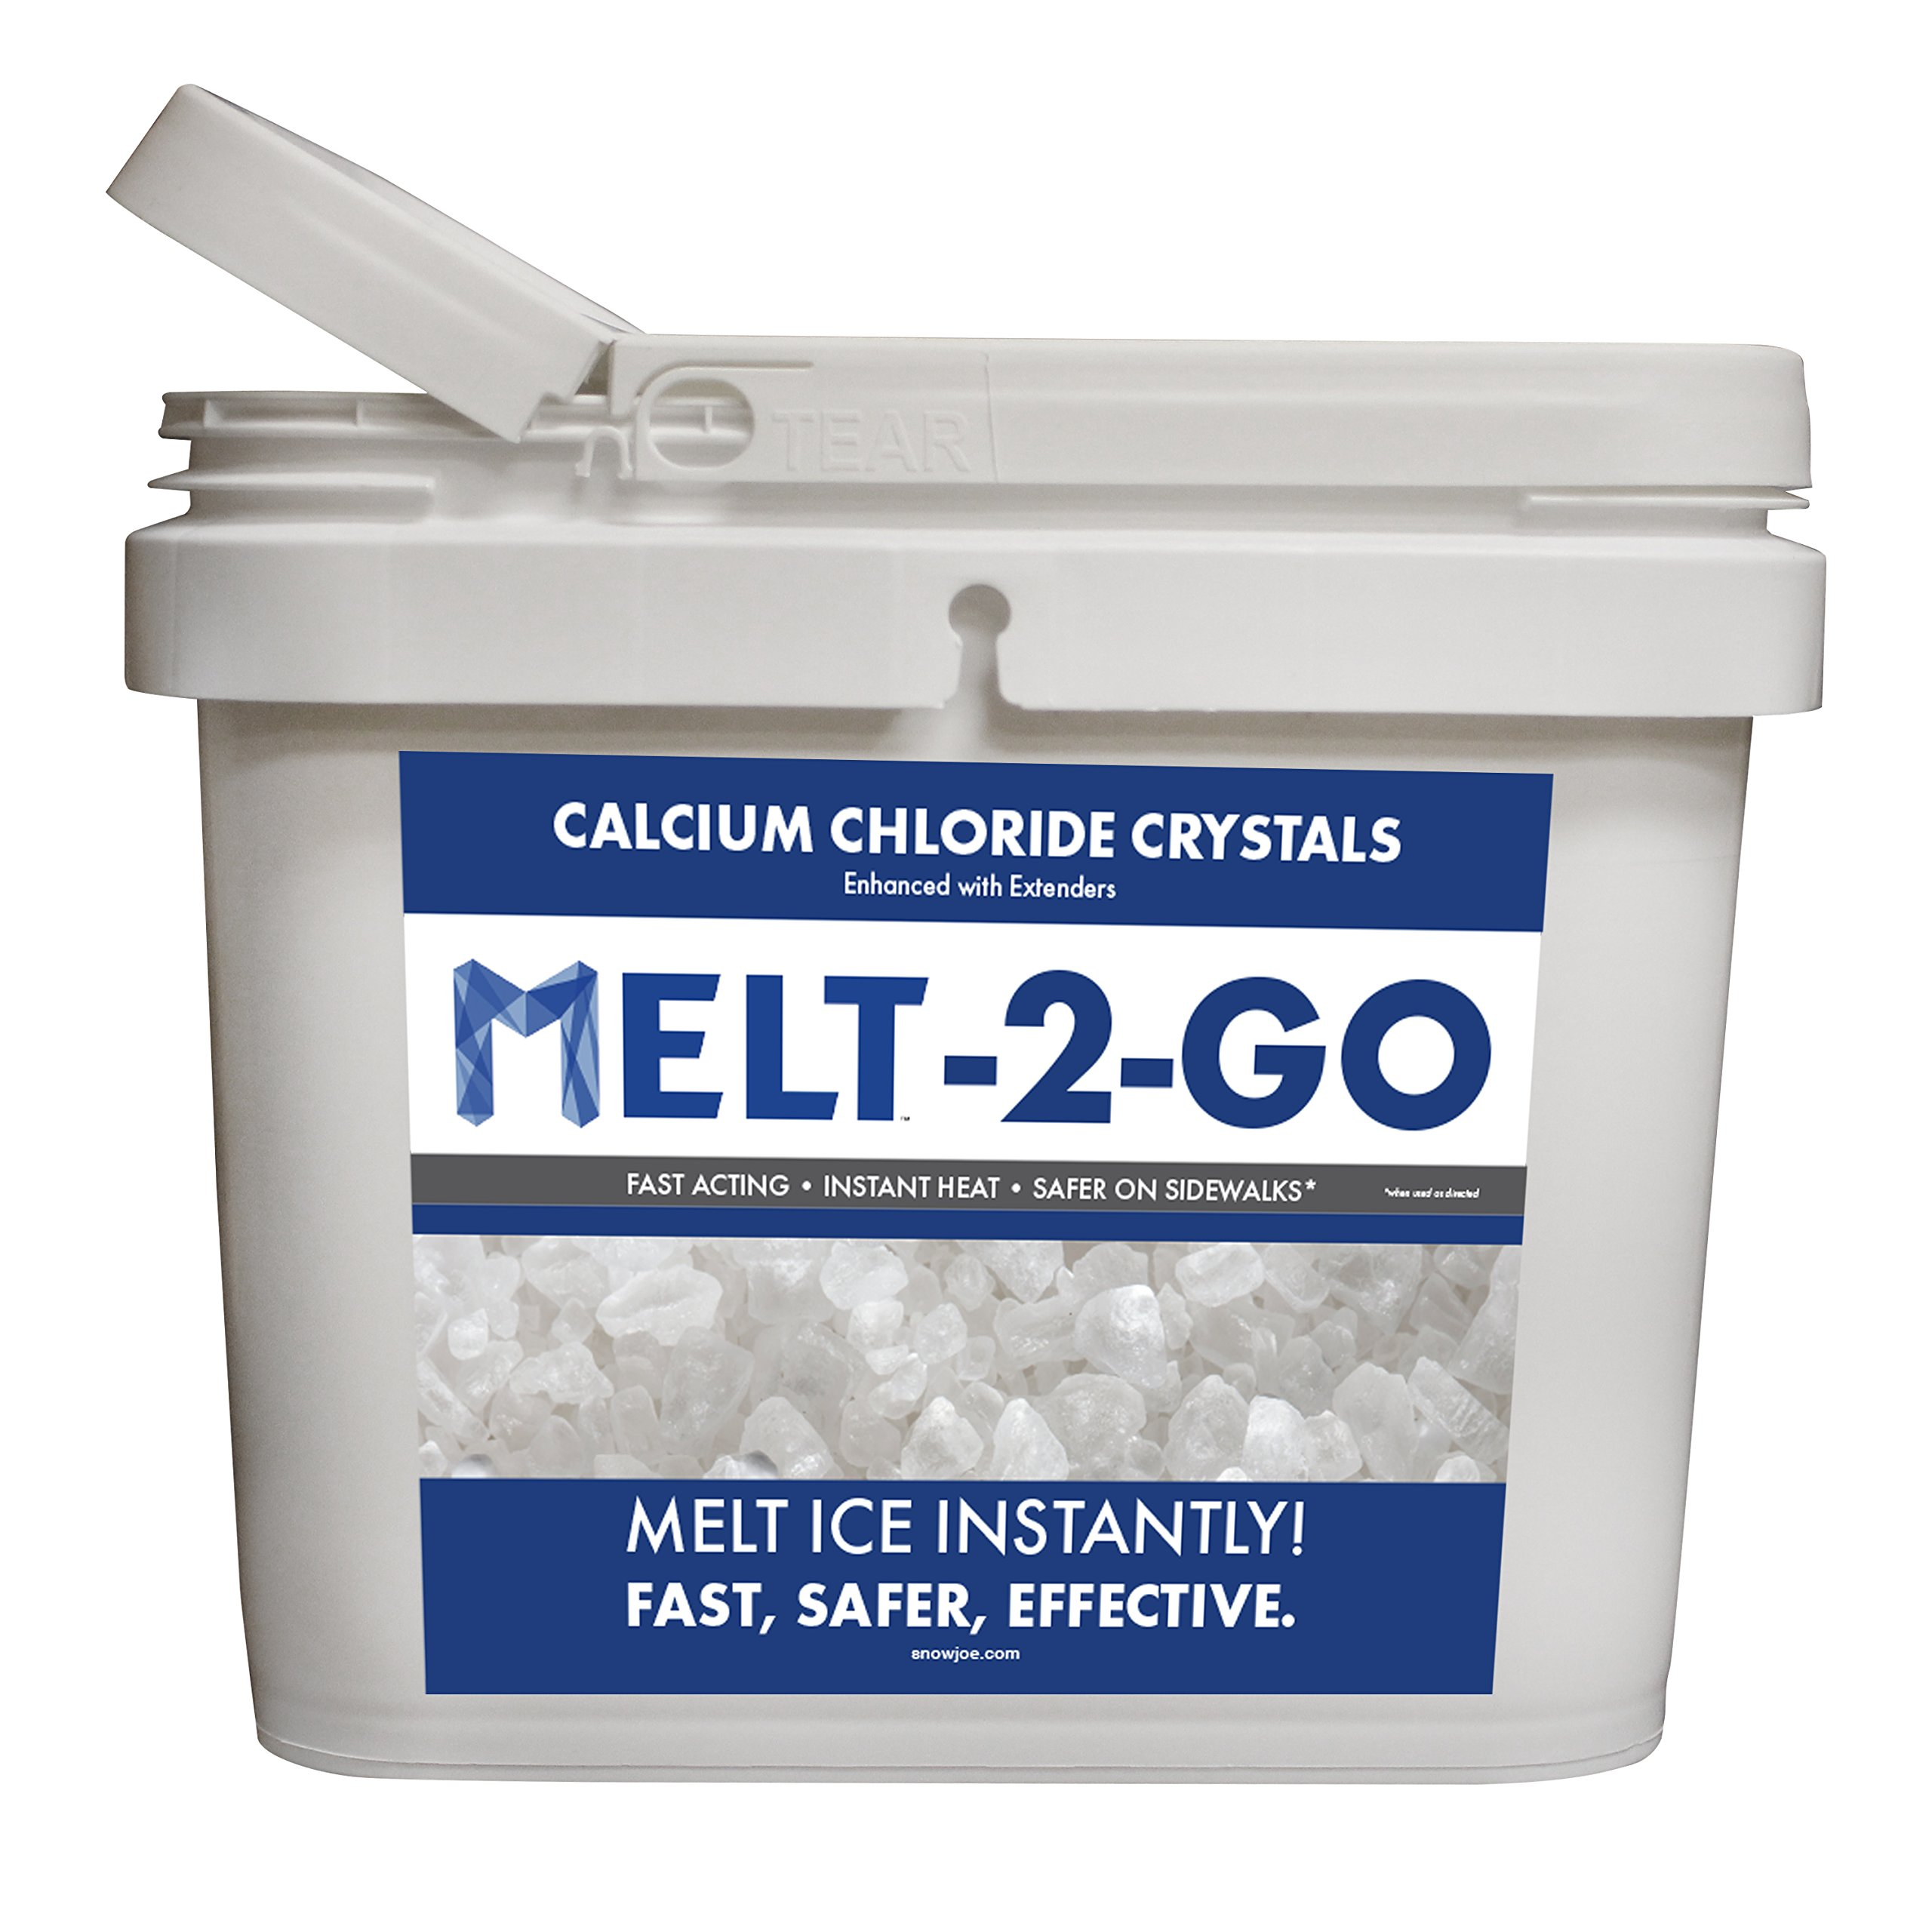 Snow Joe AZ-25-CC-BKT Melt-2-Go Premium Calcium Chloride Crystal Ice Melter, 25-lb Flip-Top Bucket W/Scooper